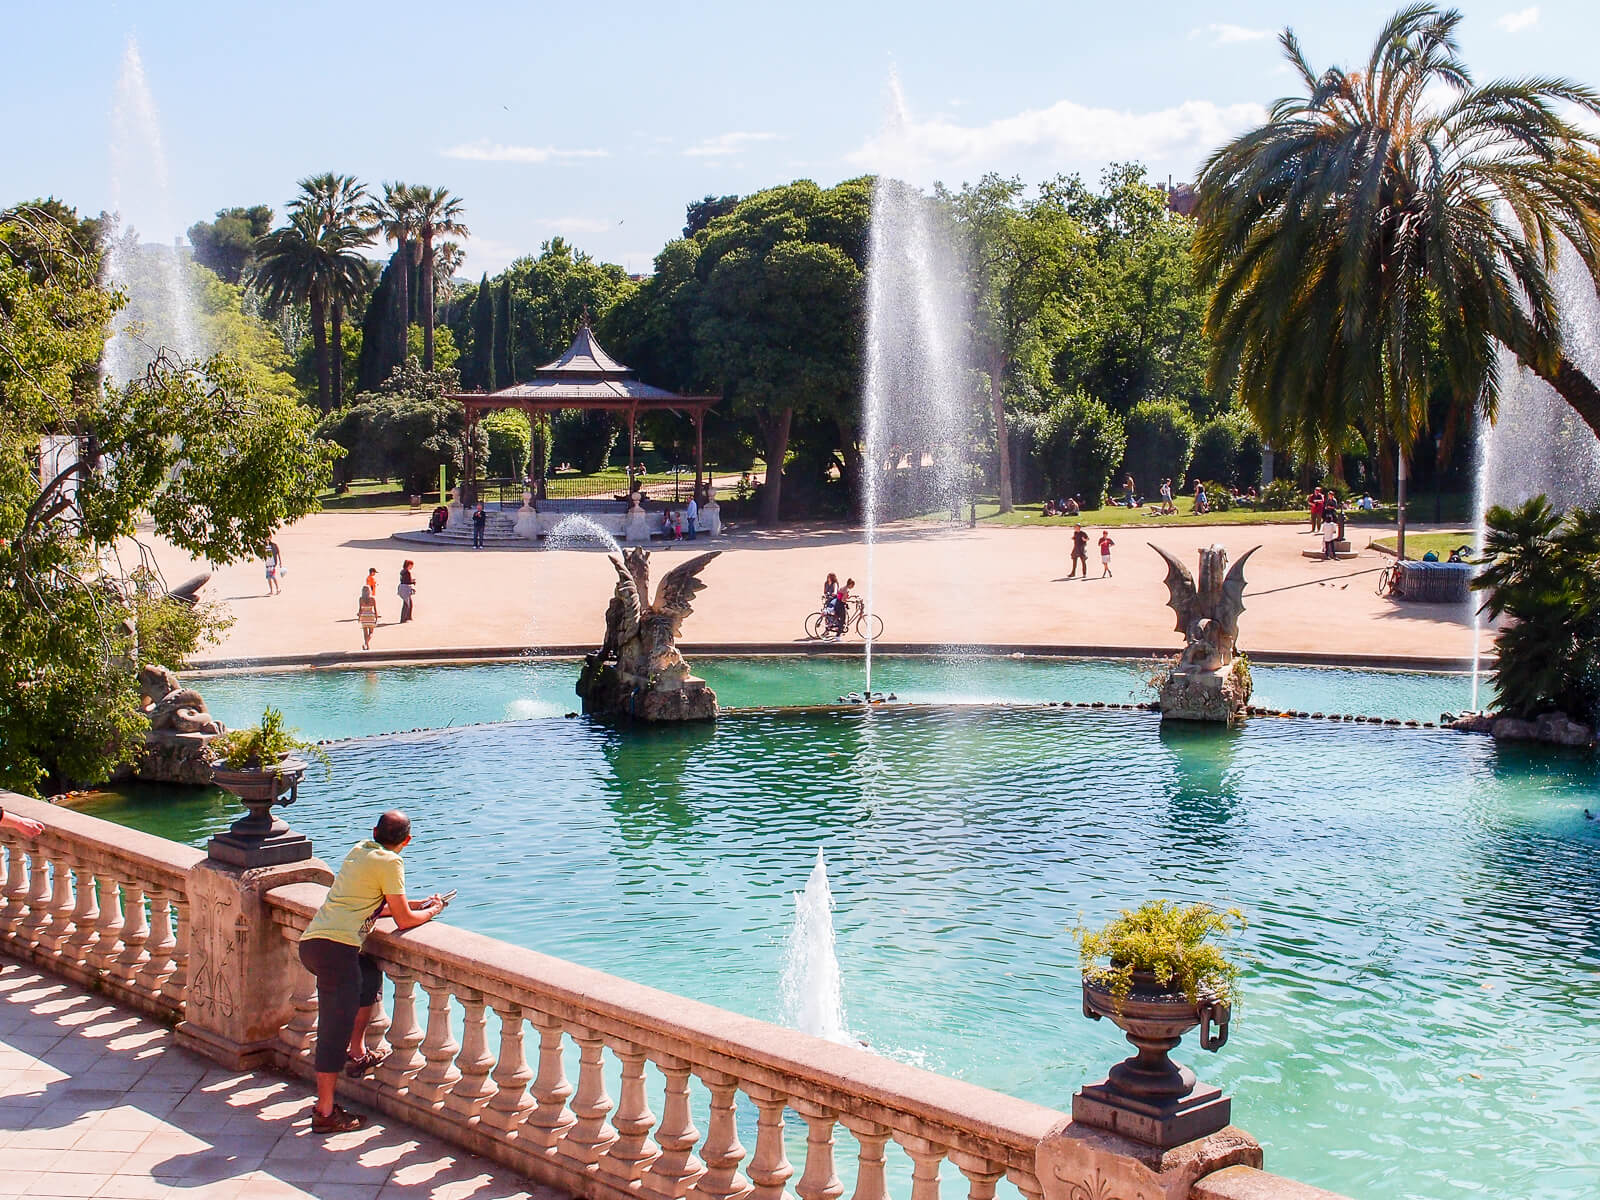 Barcelona Street Photography, cascada monumental fountain pool, park pavillion, stone balustrade